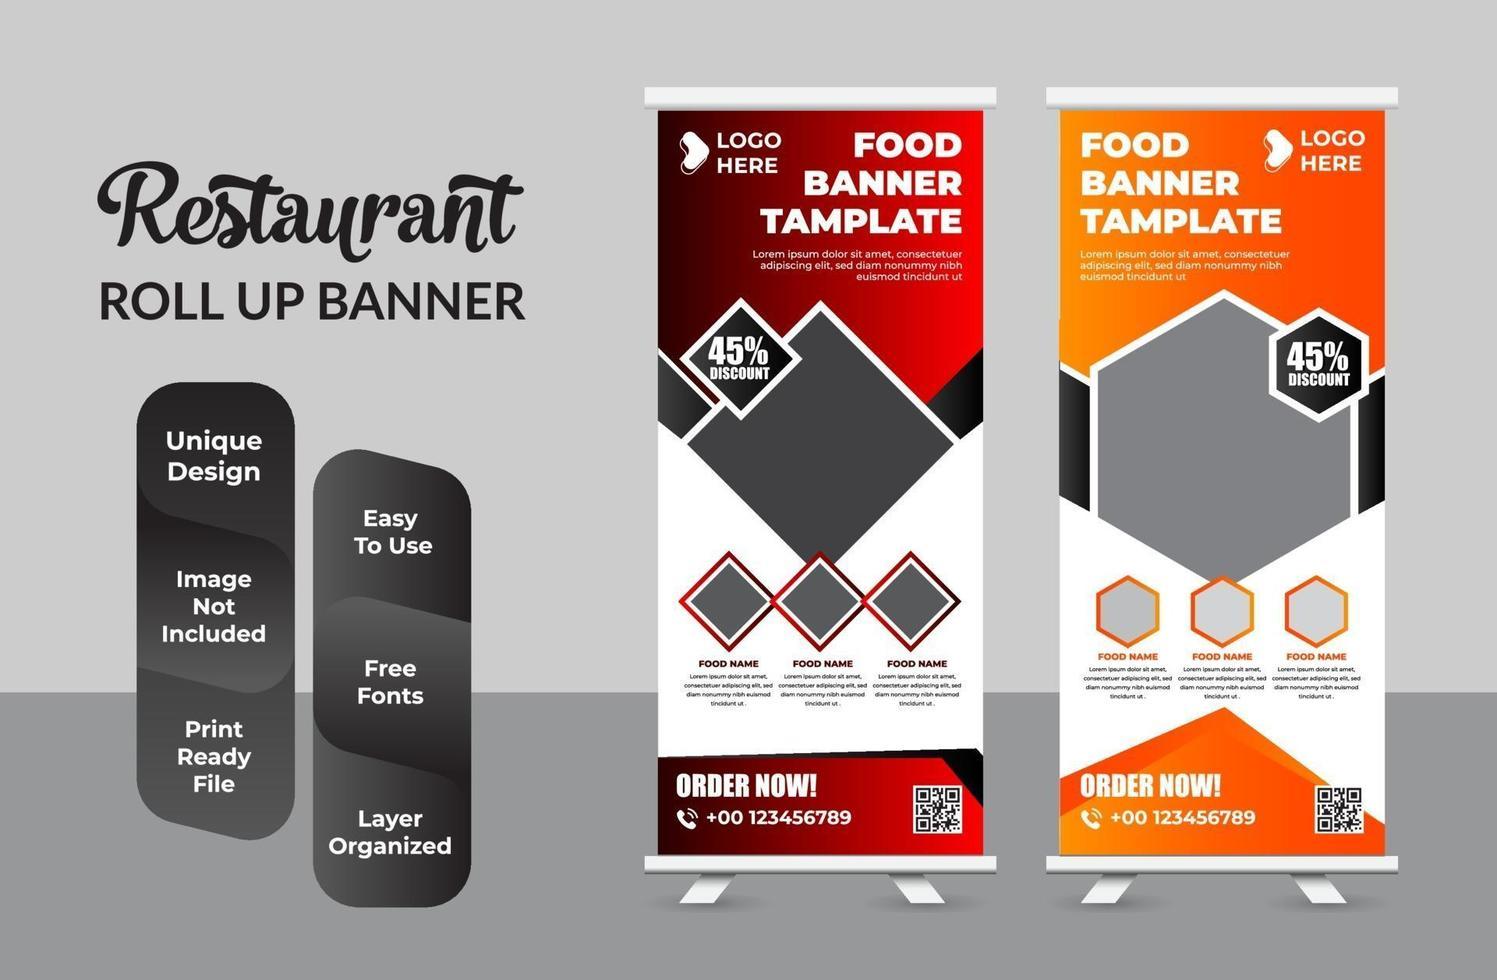 Restaurant business Roll up banner template design set vector